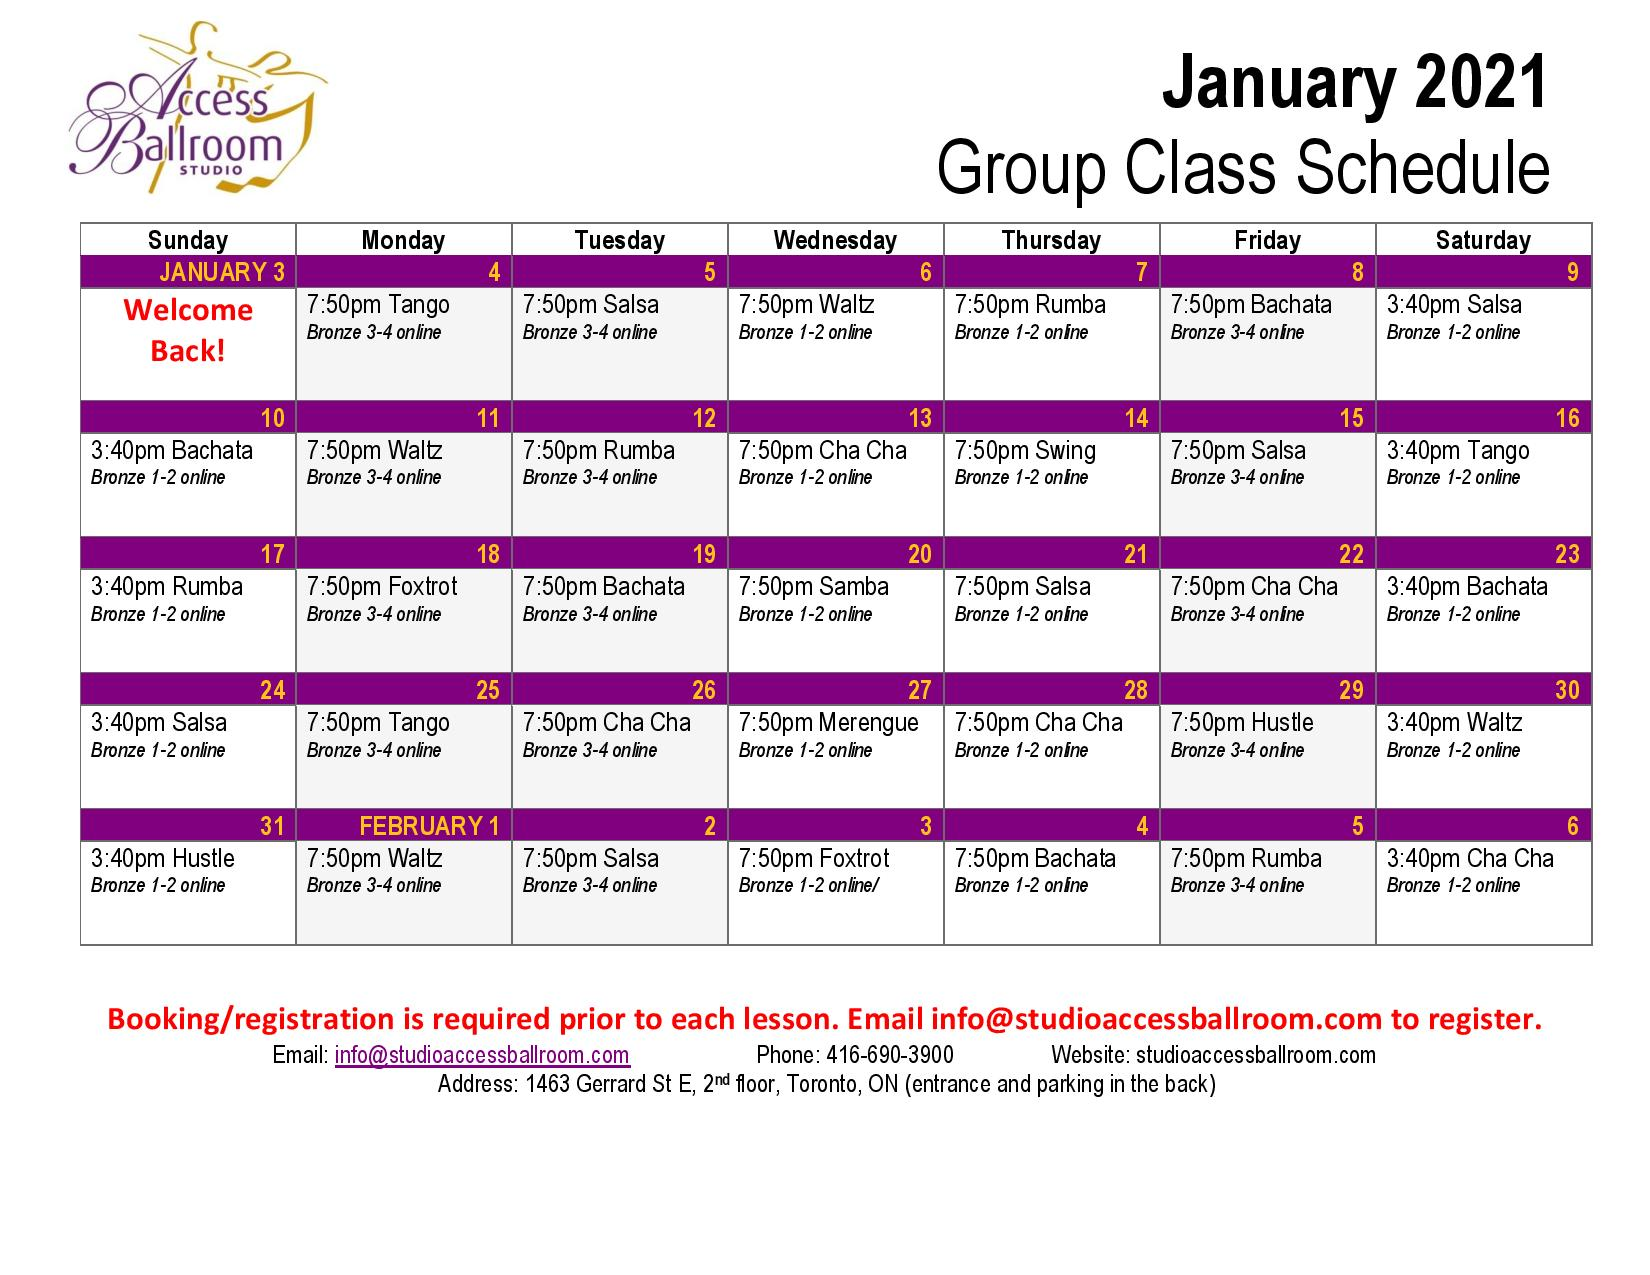 Access Ballroom january 2021 schedule